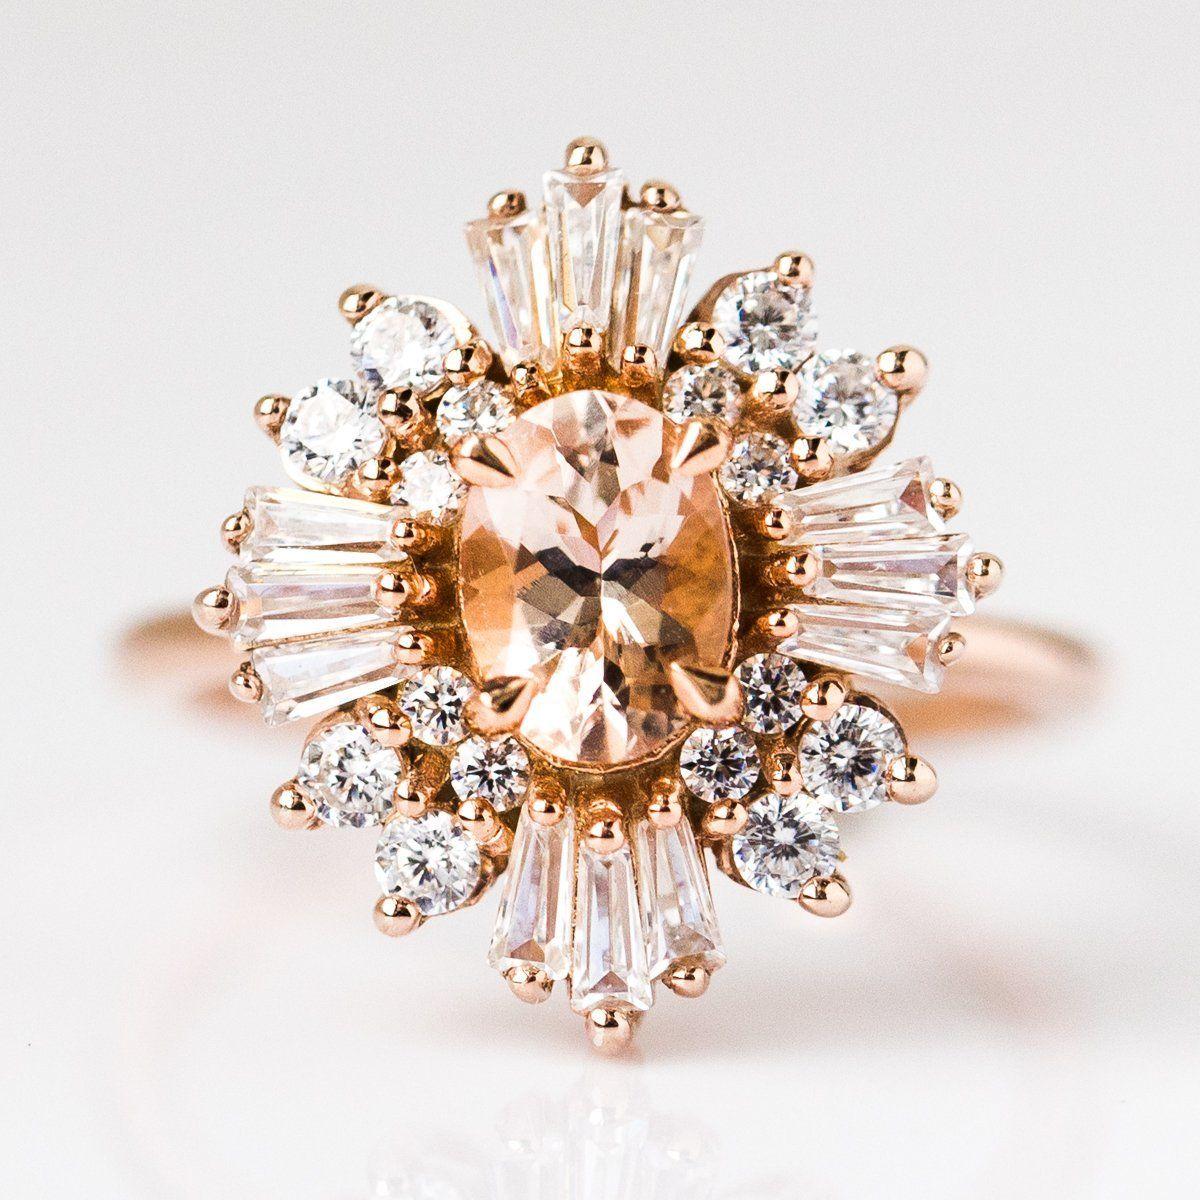 Victoria Romantic Cluster Ring Black hills gold jewelry